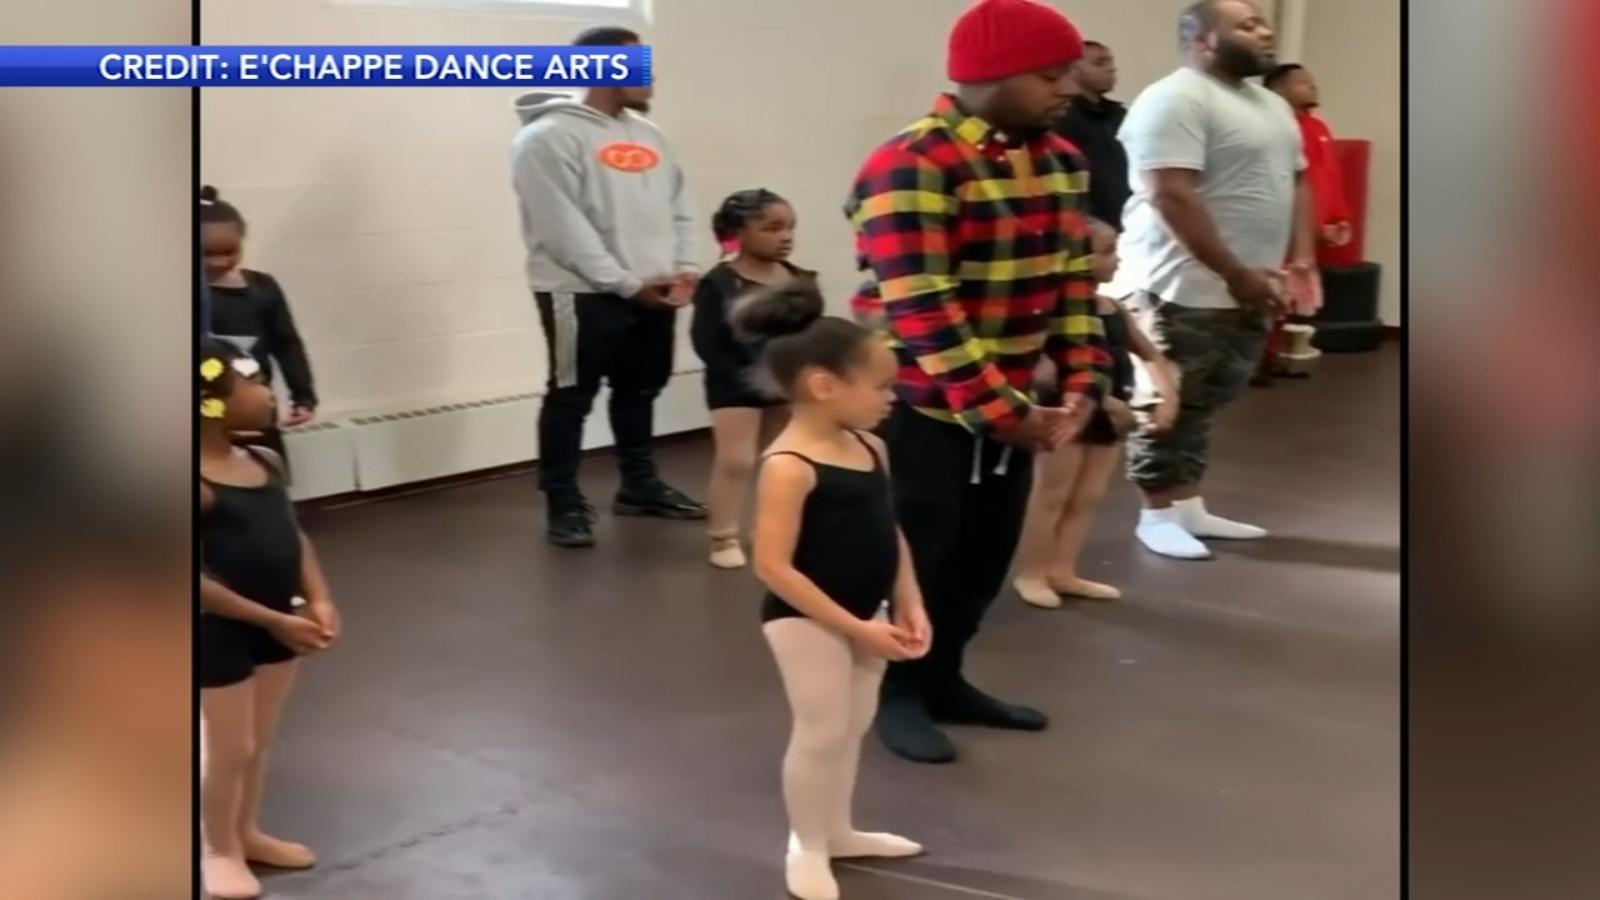 Daddy-daughter dance gets attention of Kristen Bell, Jennifer Garner - WABC-TV